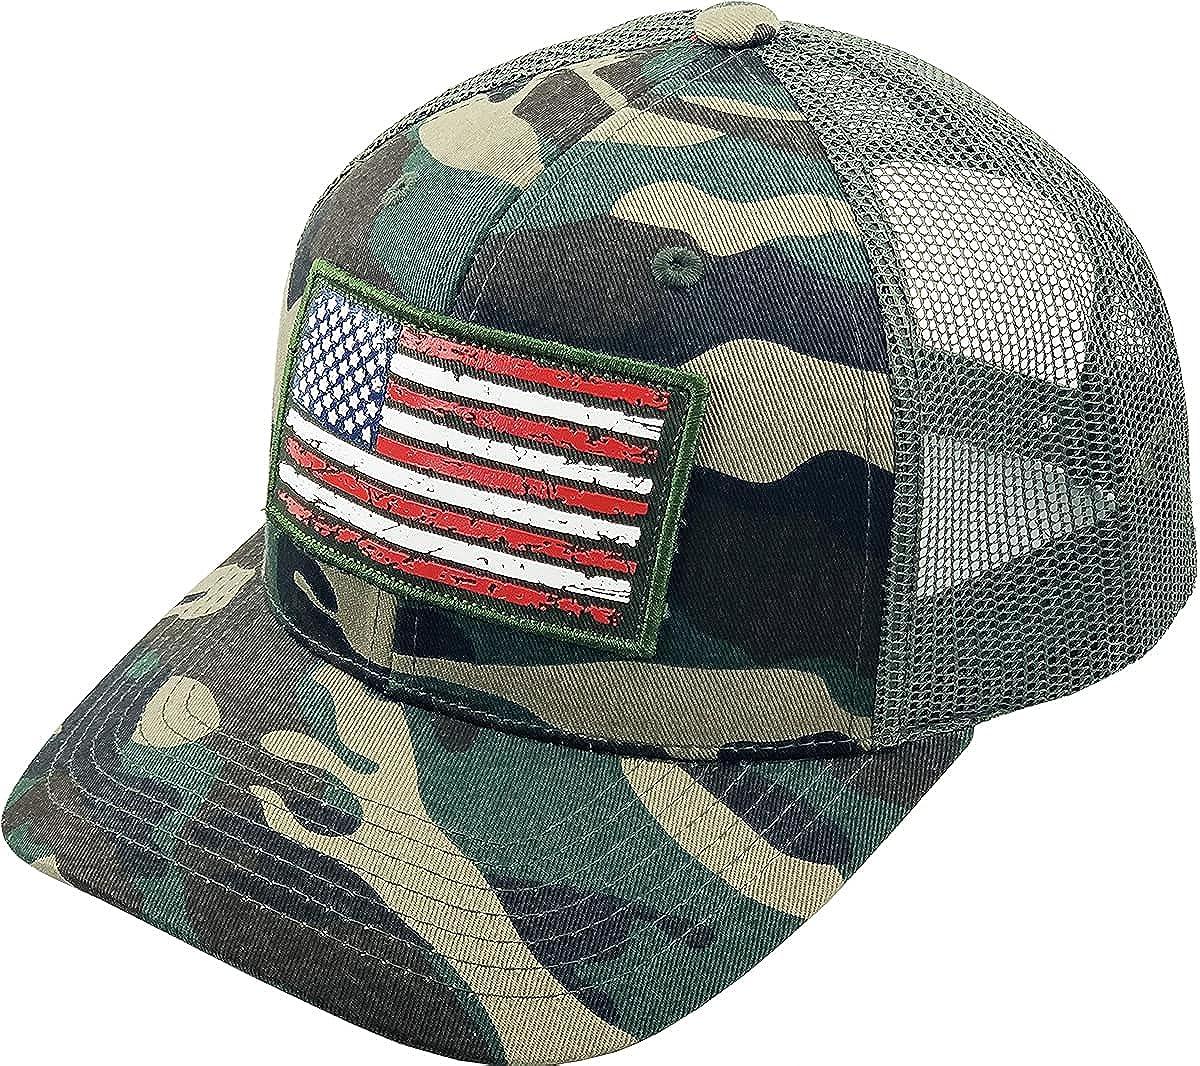 Funky Junque Mens Snapback Hat Max 84% OFF American Baseball Flag Trucker Ca OFFer